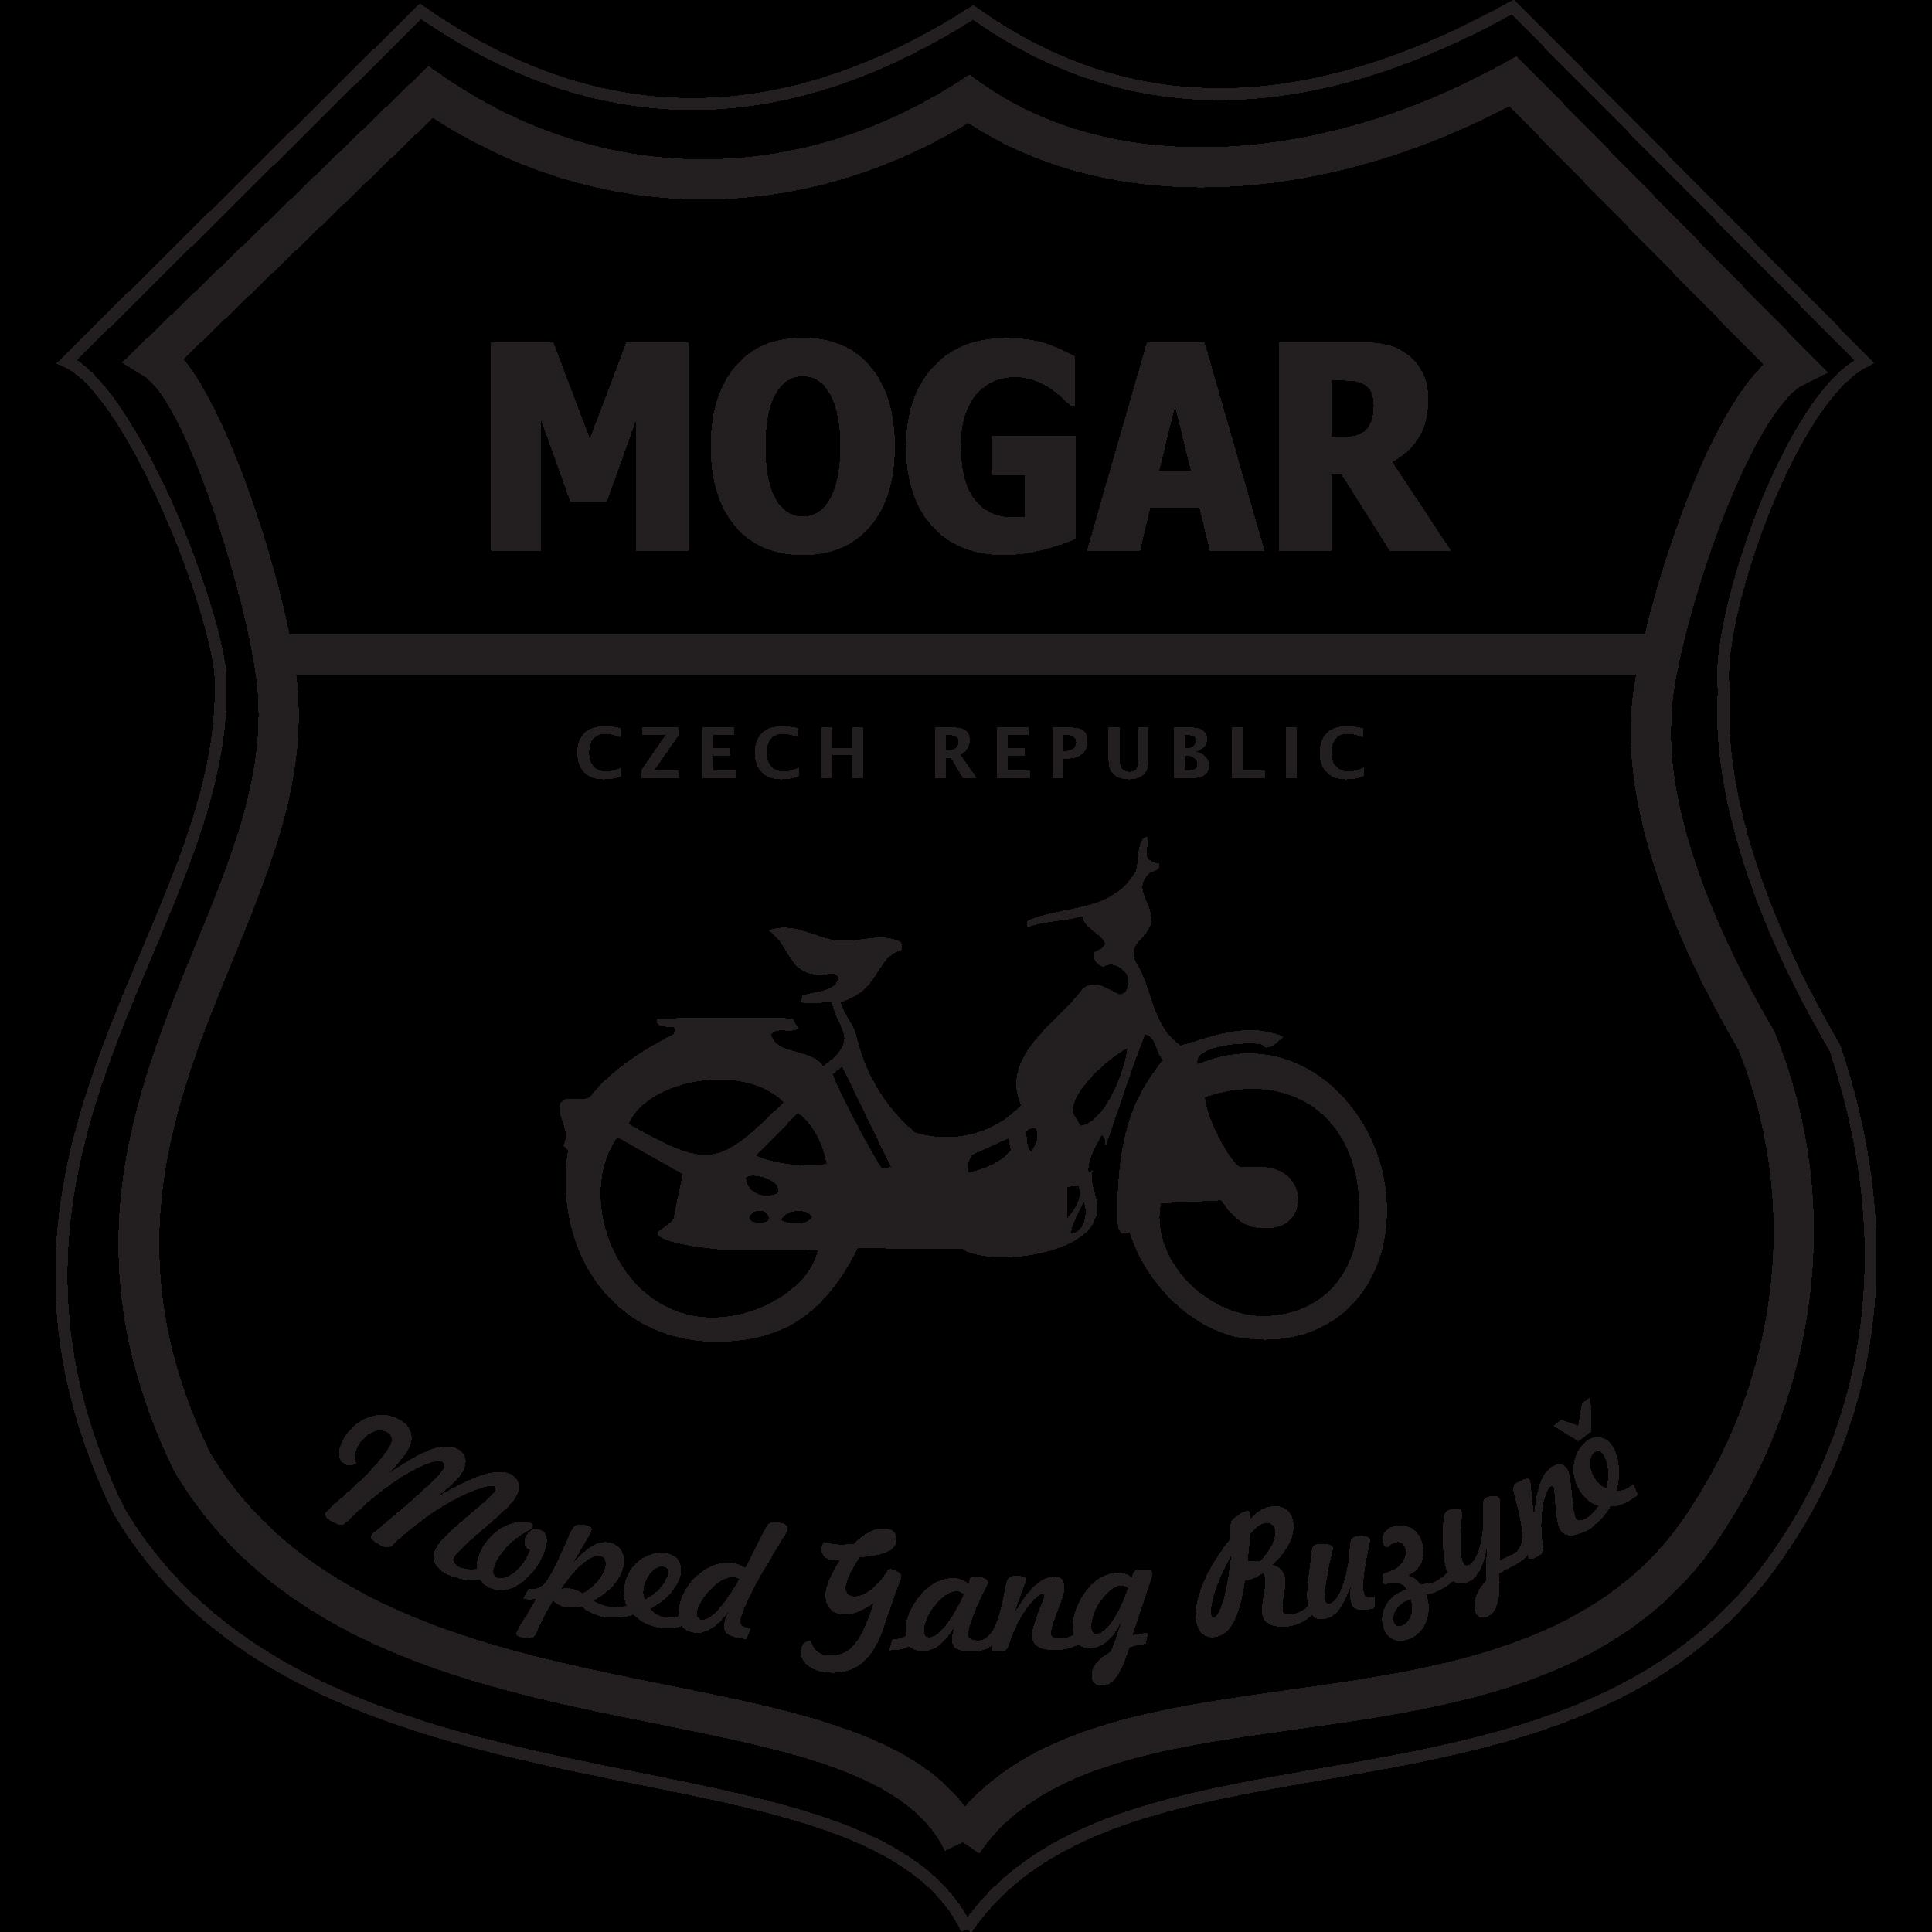 Moped Gang Praha Ruzyně